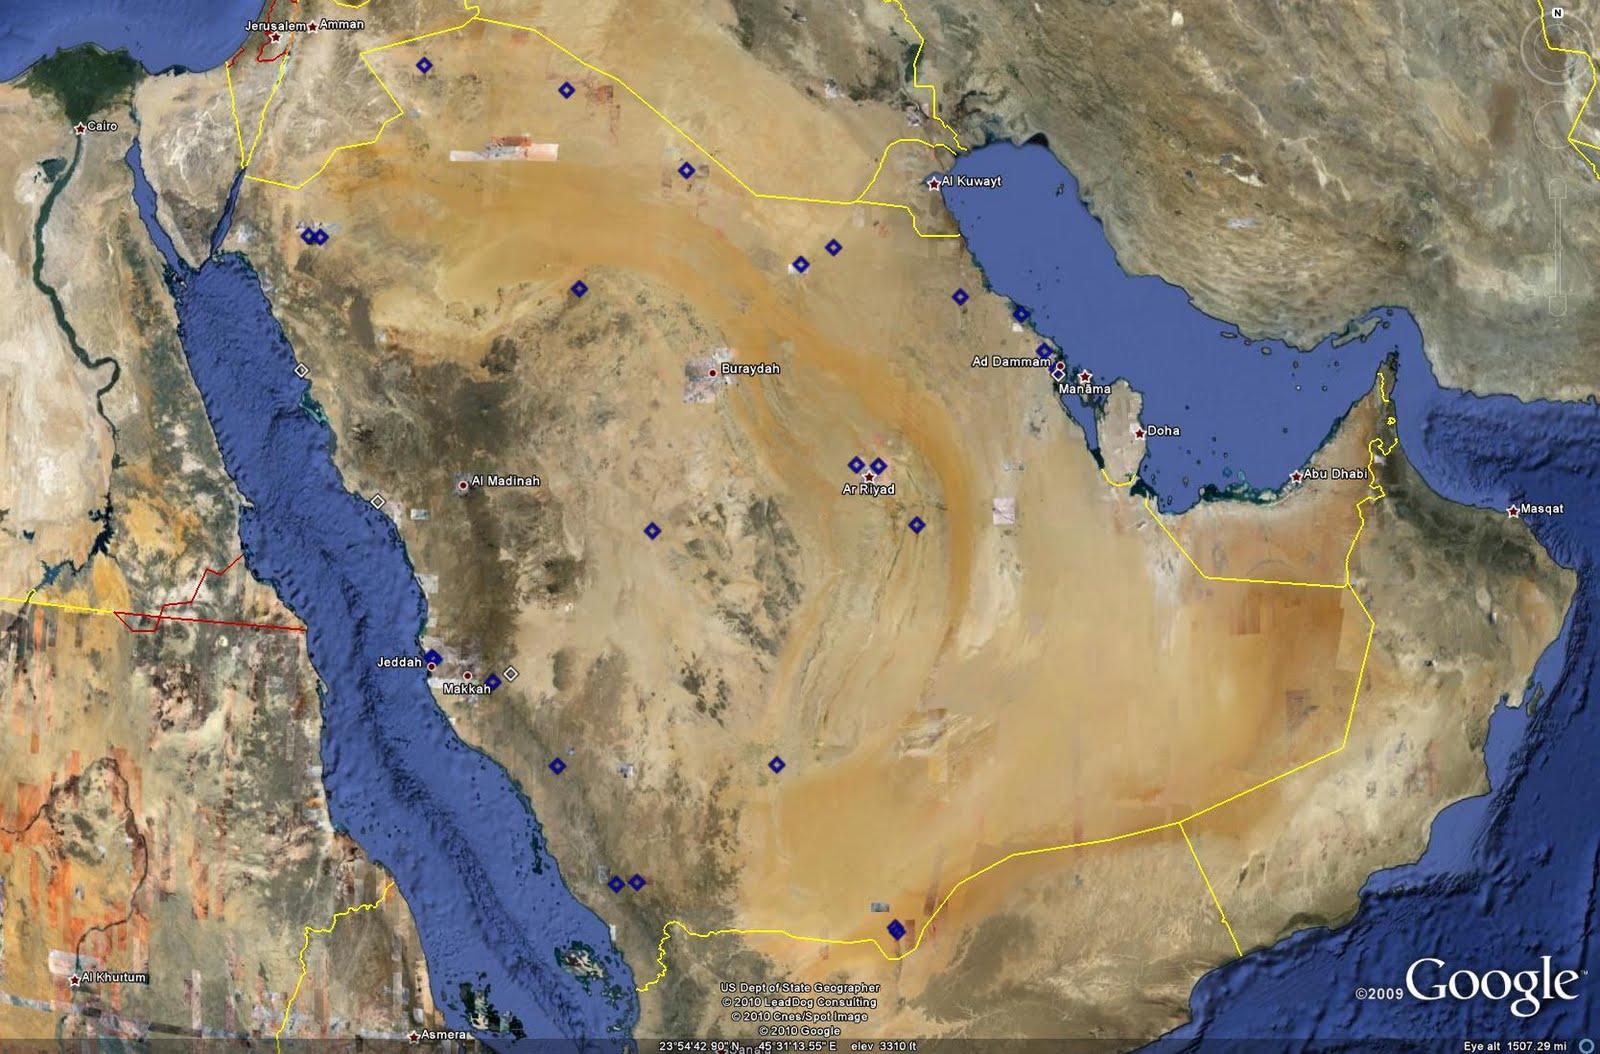 https://www.evwind.es/wp-content/uploads/2012/07/Saudi-Arabia1.jpg